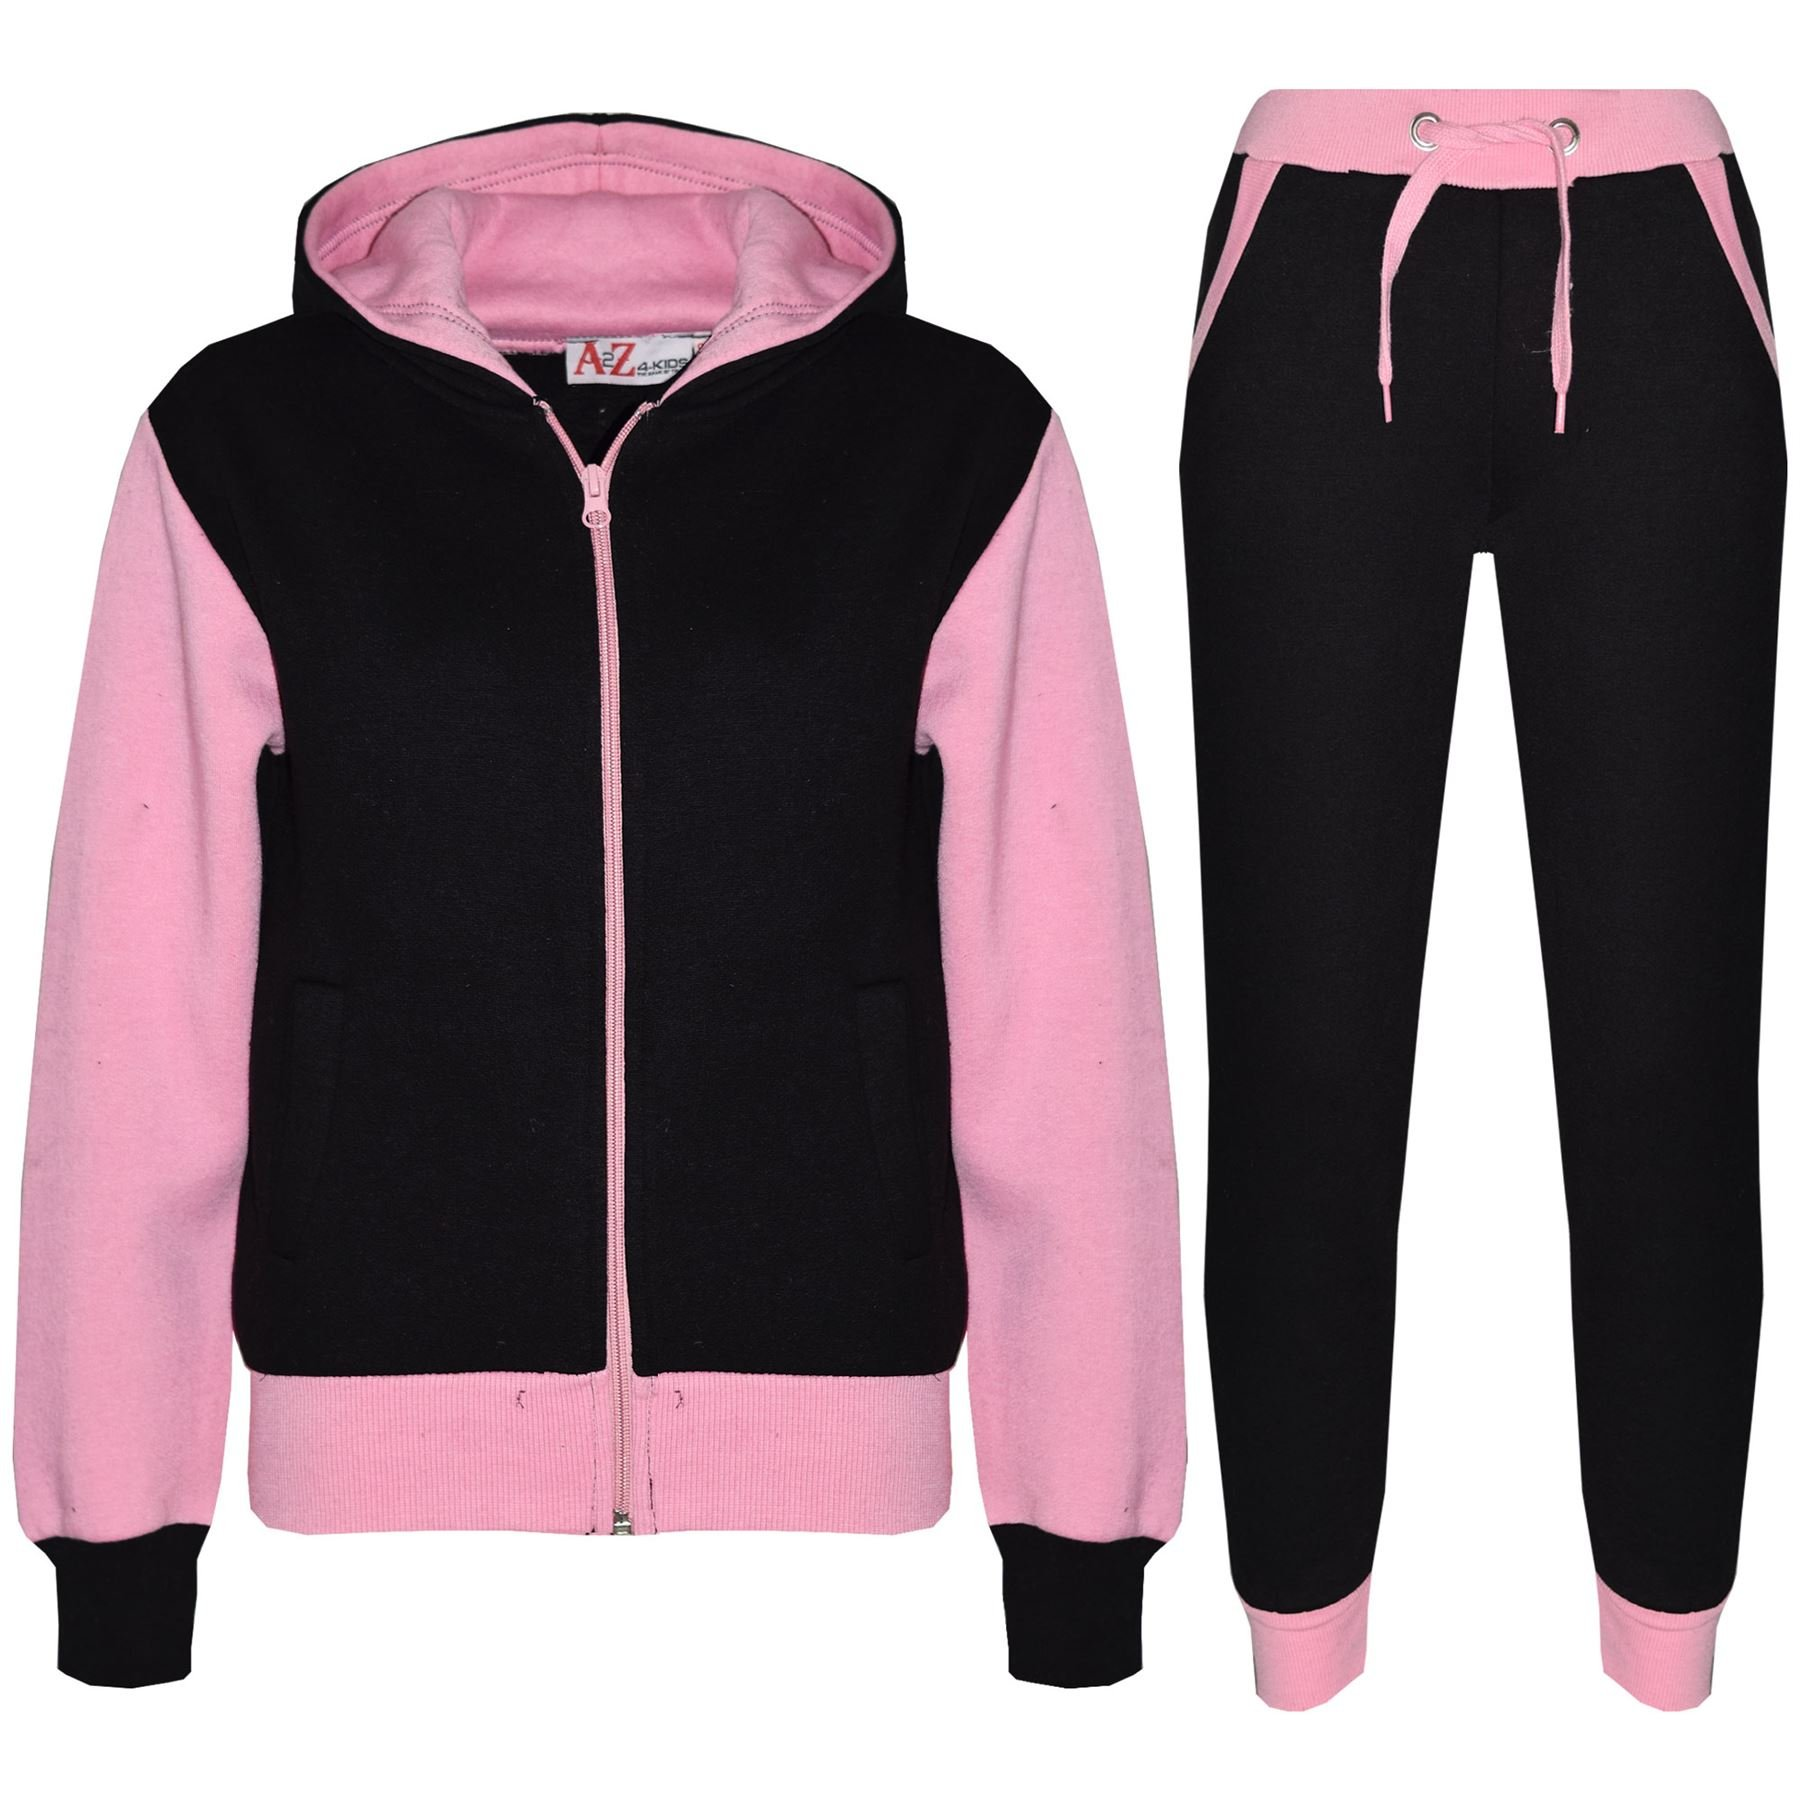 A2Z 4 Kids® Kids Tracksuit Girls Boys Fleece Hooded Hoodie Bottom Jogging Suit Jogger 7-13Yr